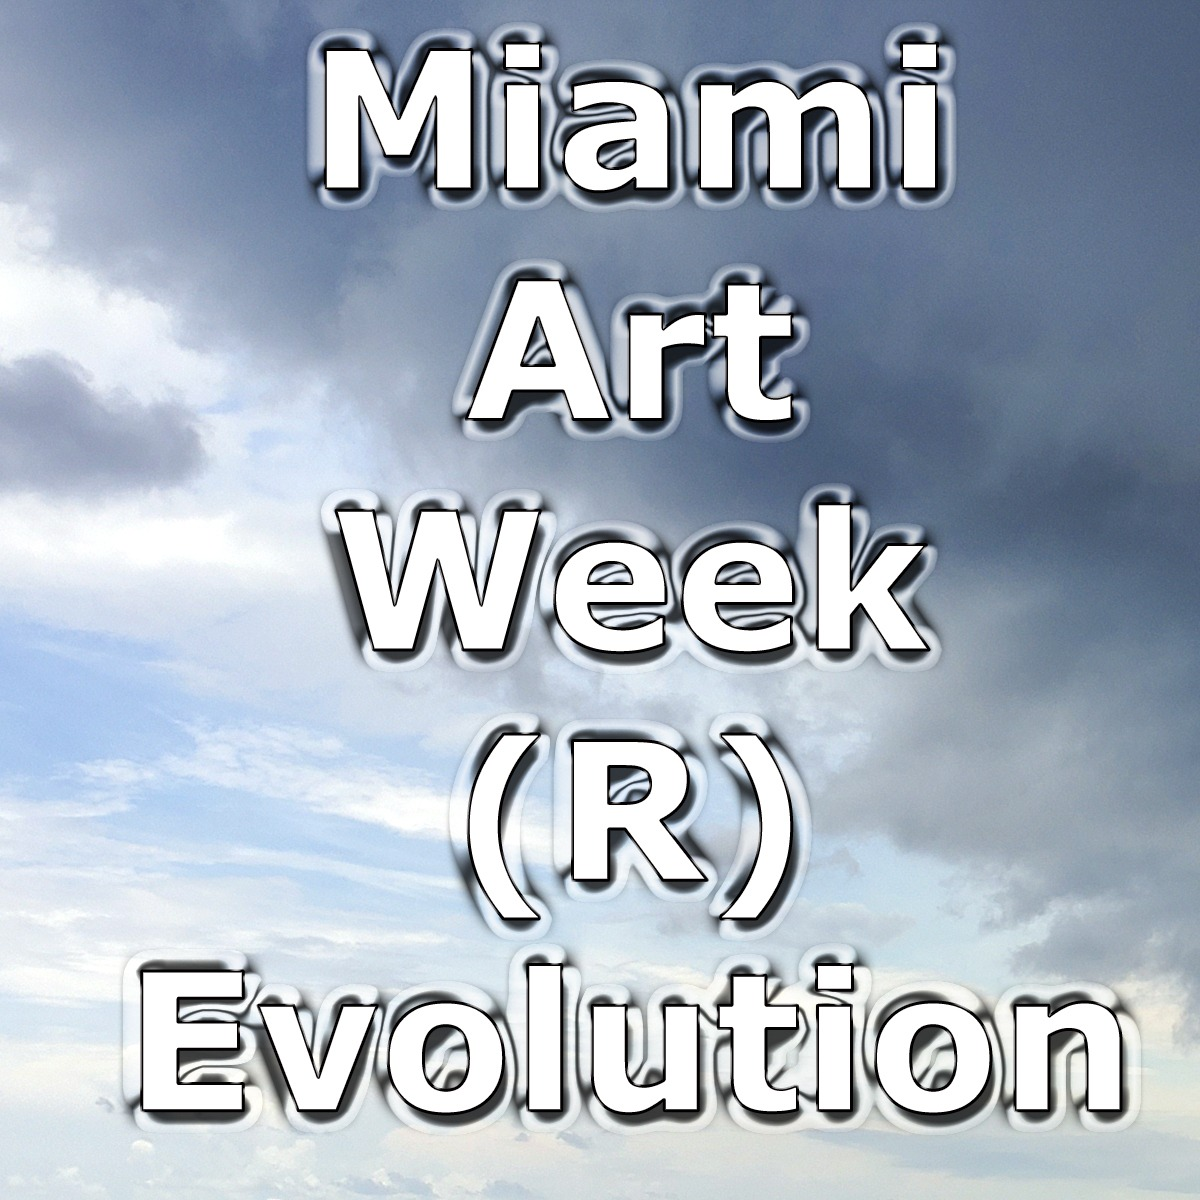 Update Regarding Miami Art Week